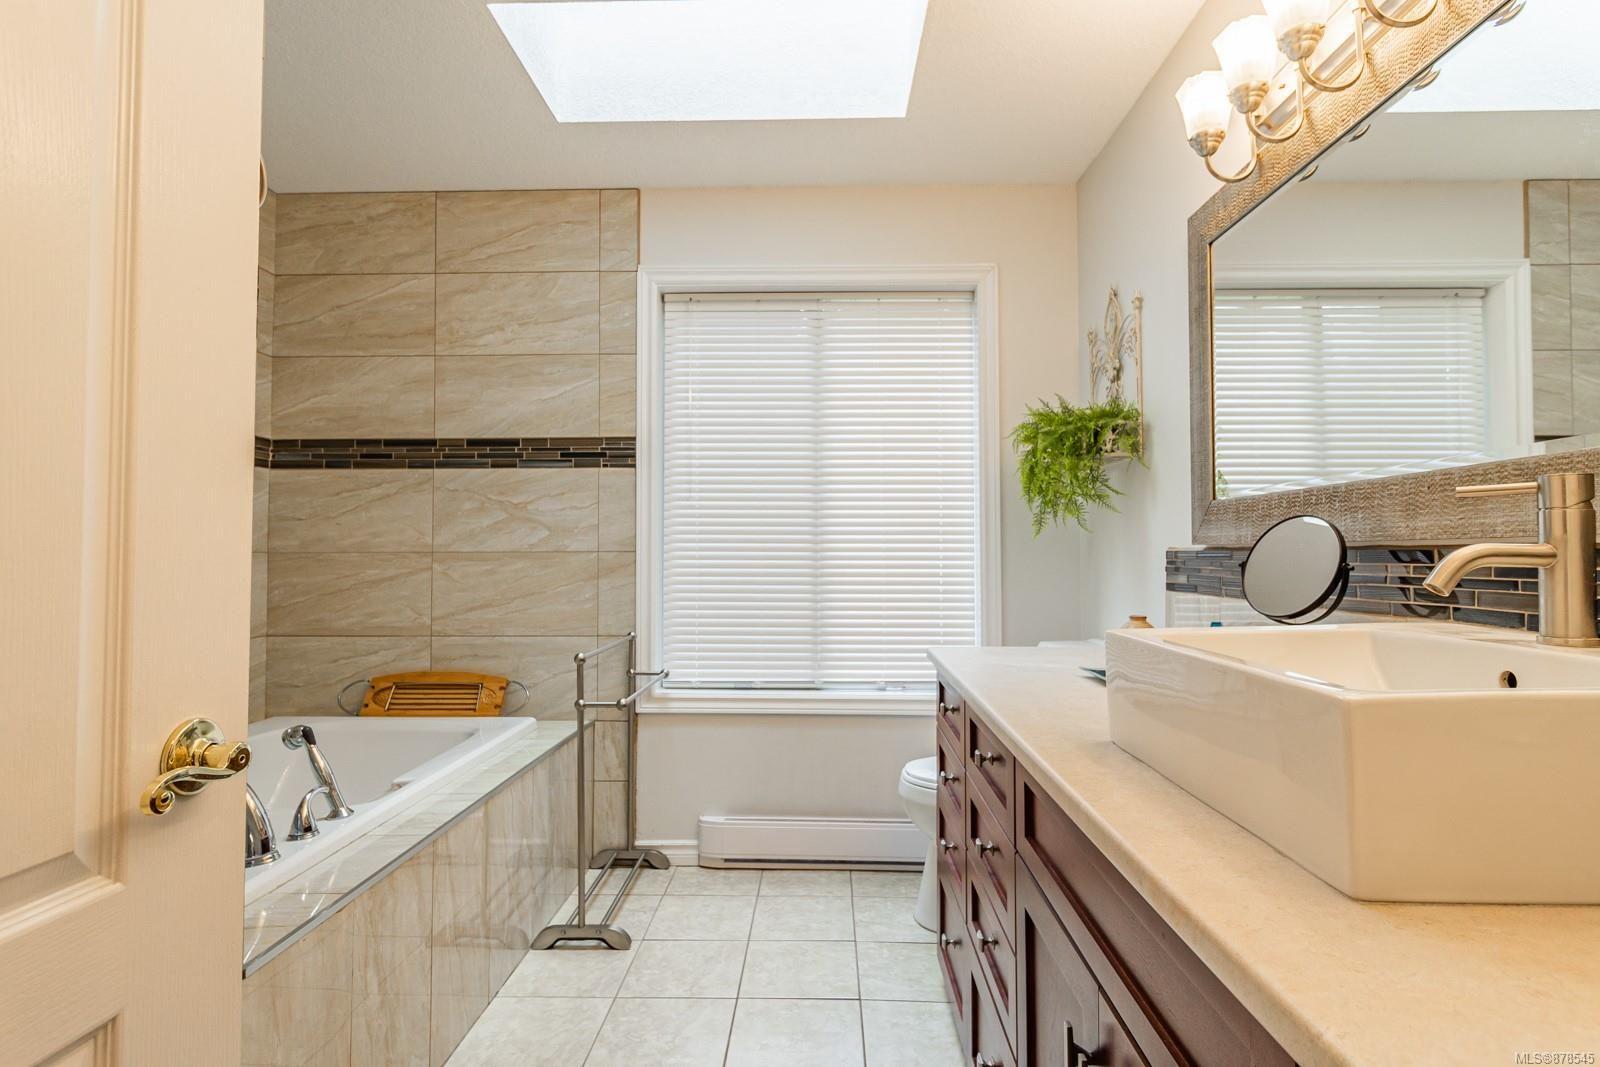 Photo 7: Photos: 1070 Symons Cres in : PQ Qualicum Beach House for sale (Parksville/Qualicum)  : MLS®# 878545